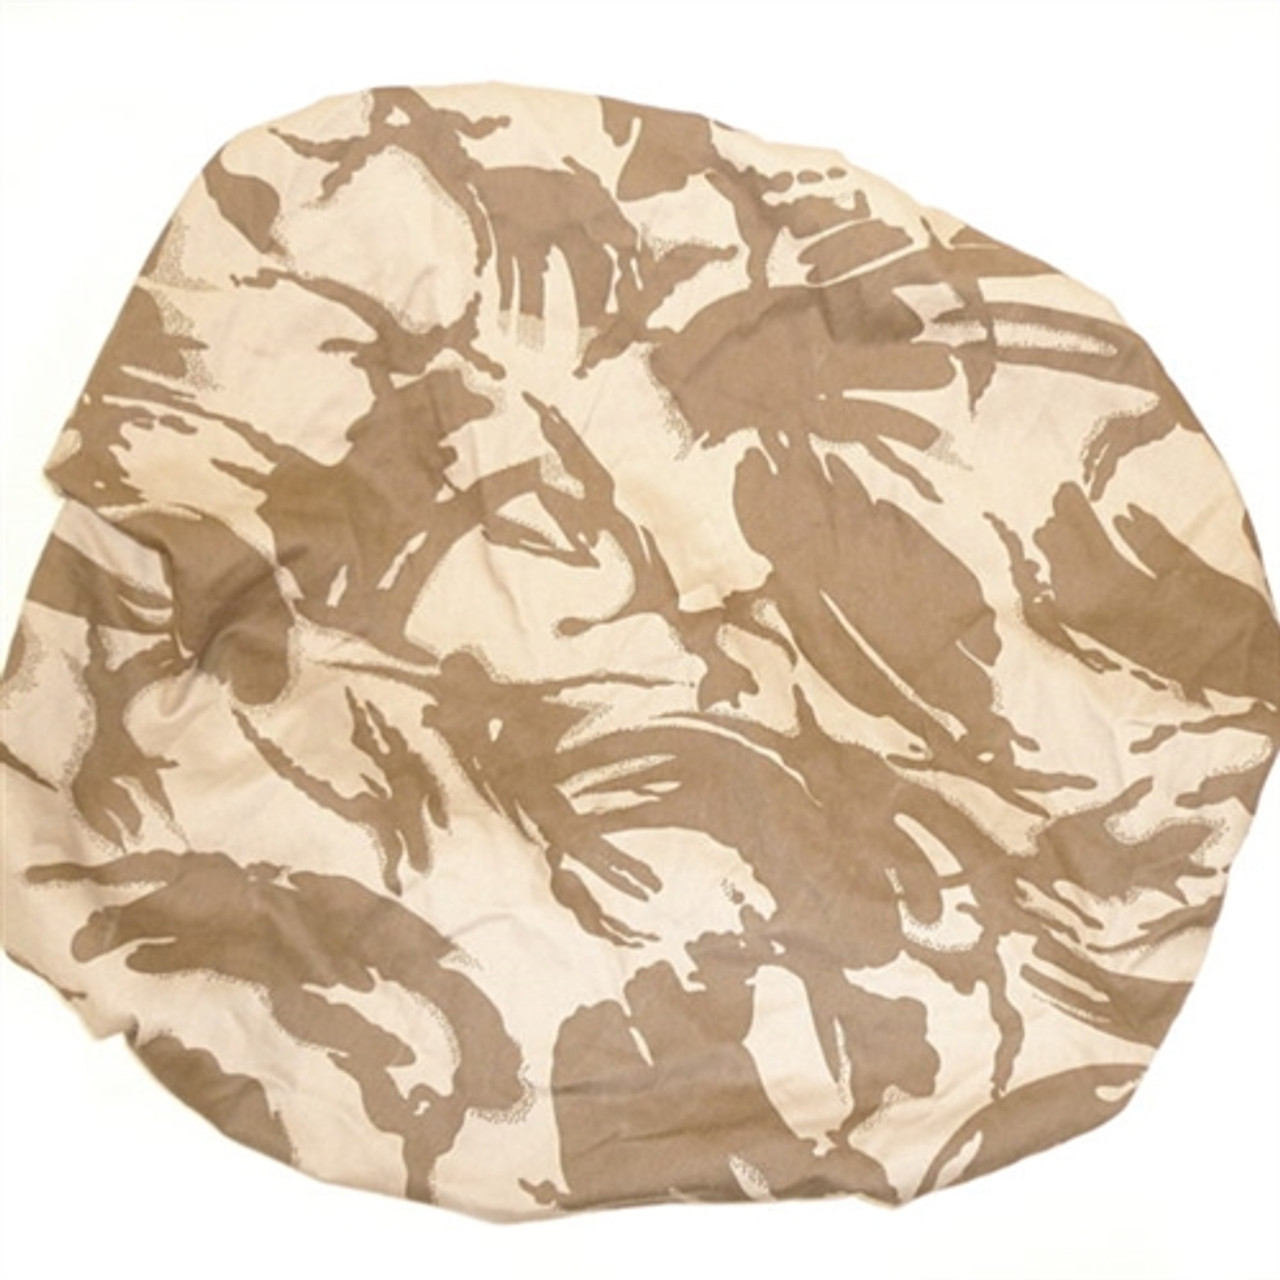 British Desert DPM Camo Rucksack Cover - Small from Hessen Antique